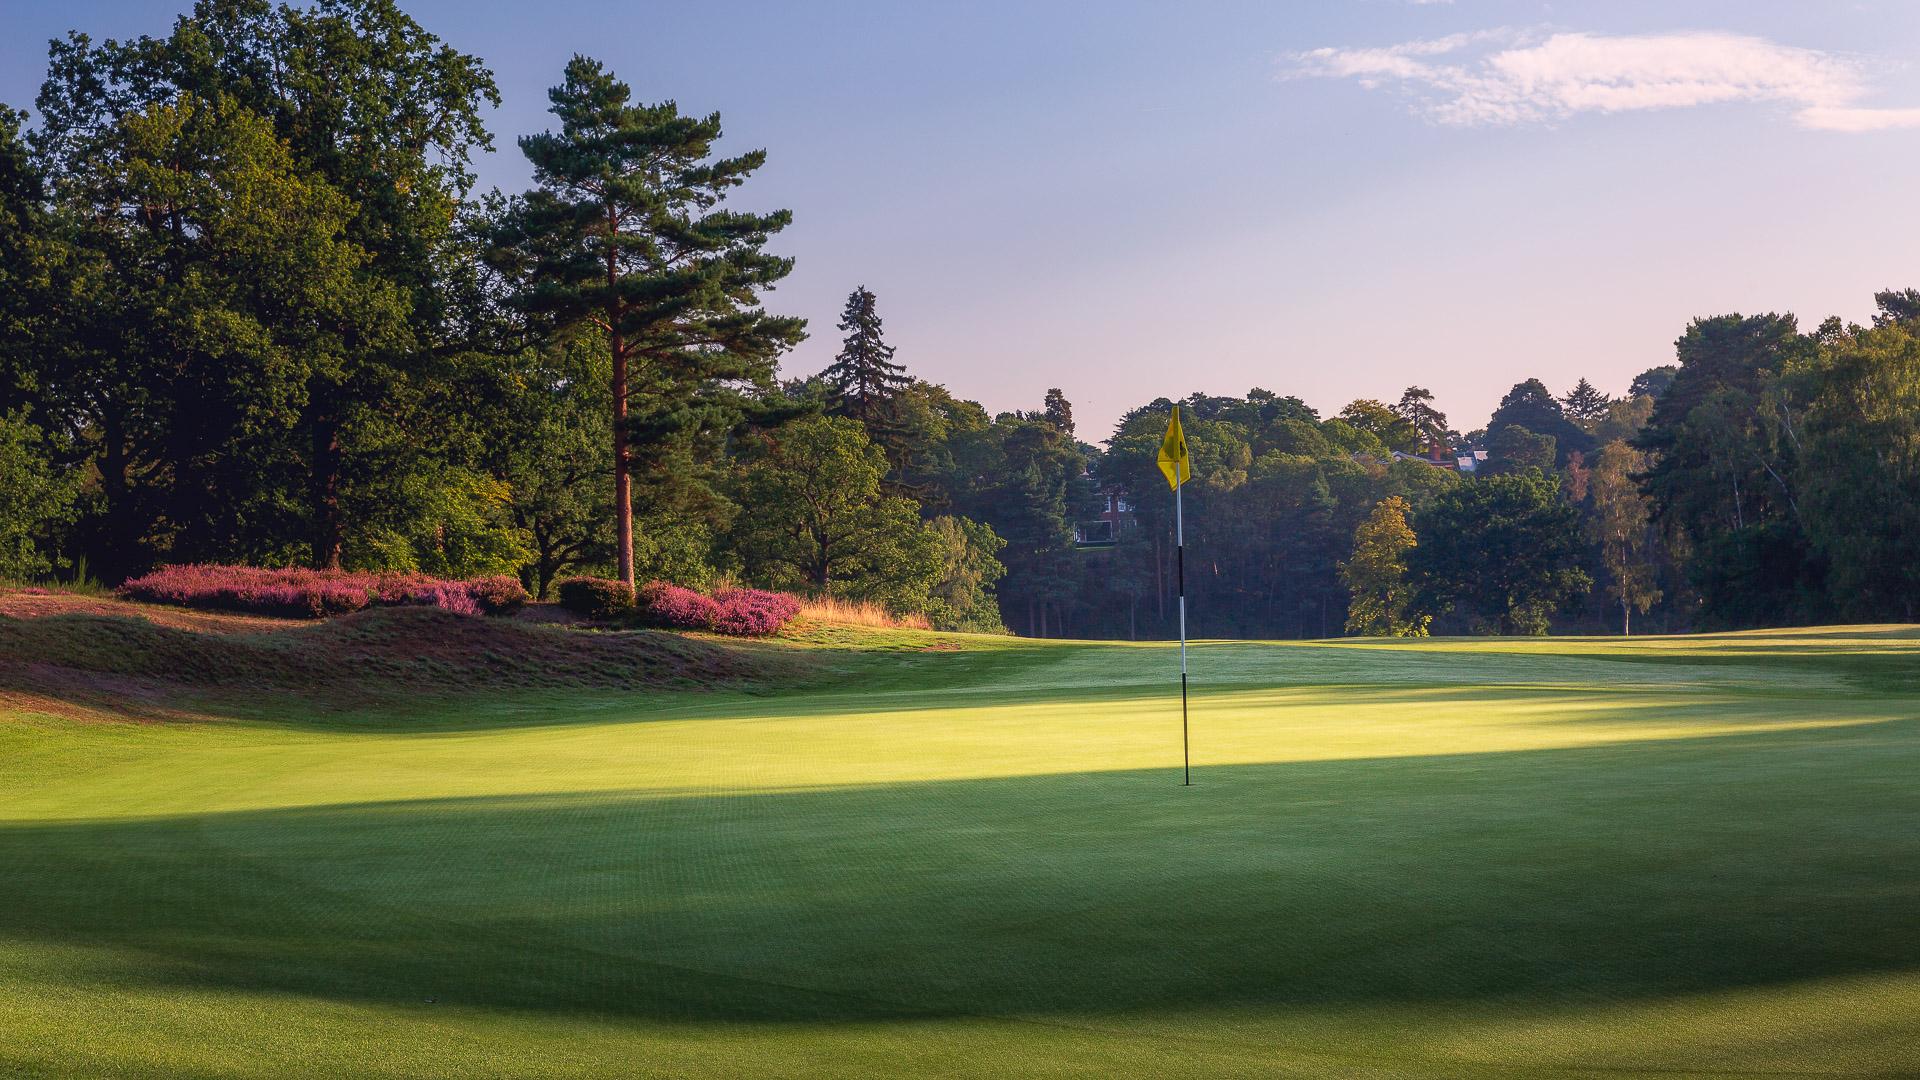 21st-Hole-St-Georges-Hill-Golf-Club-2000-Edit